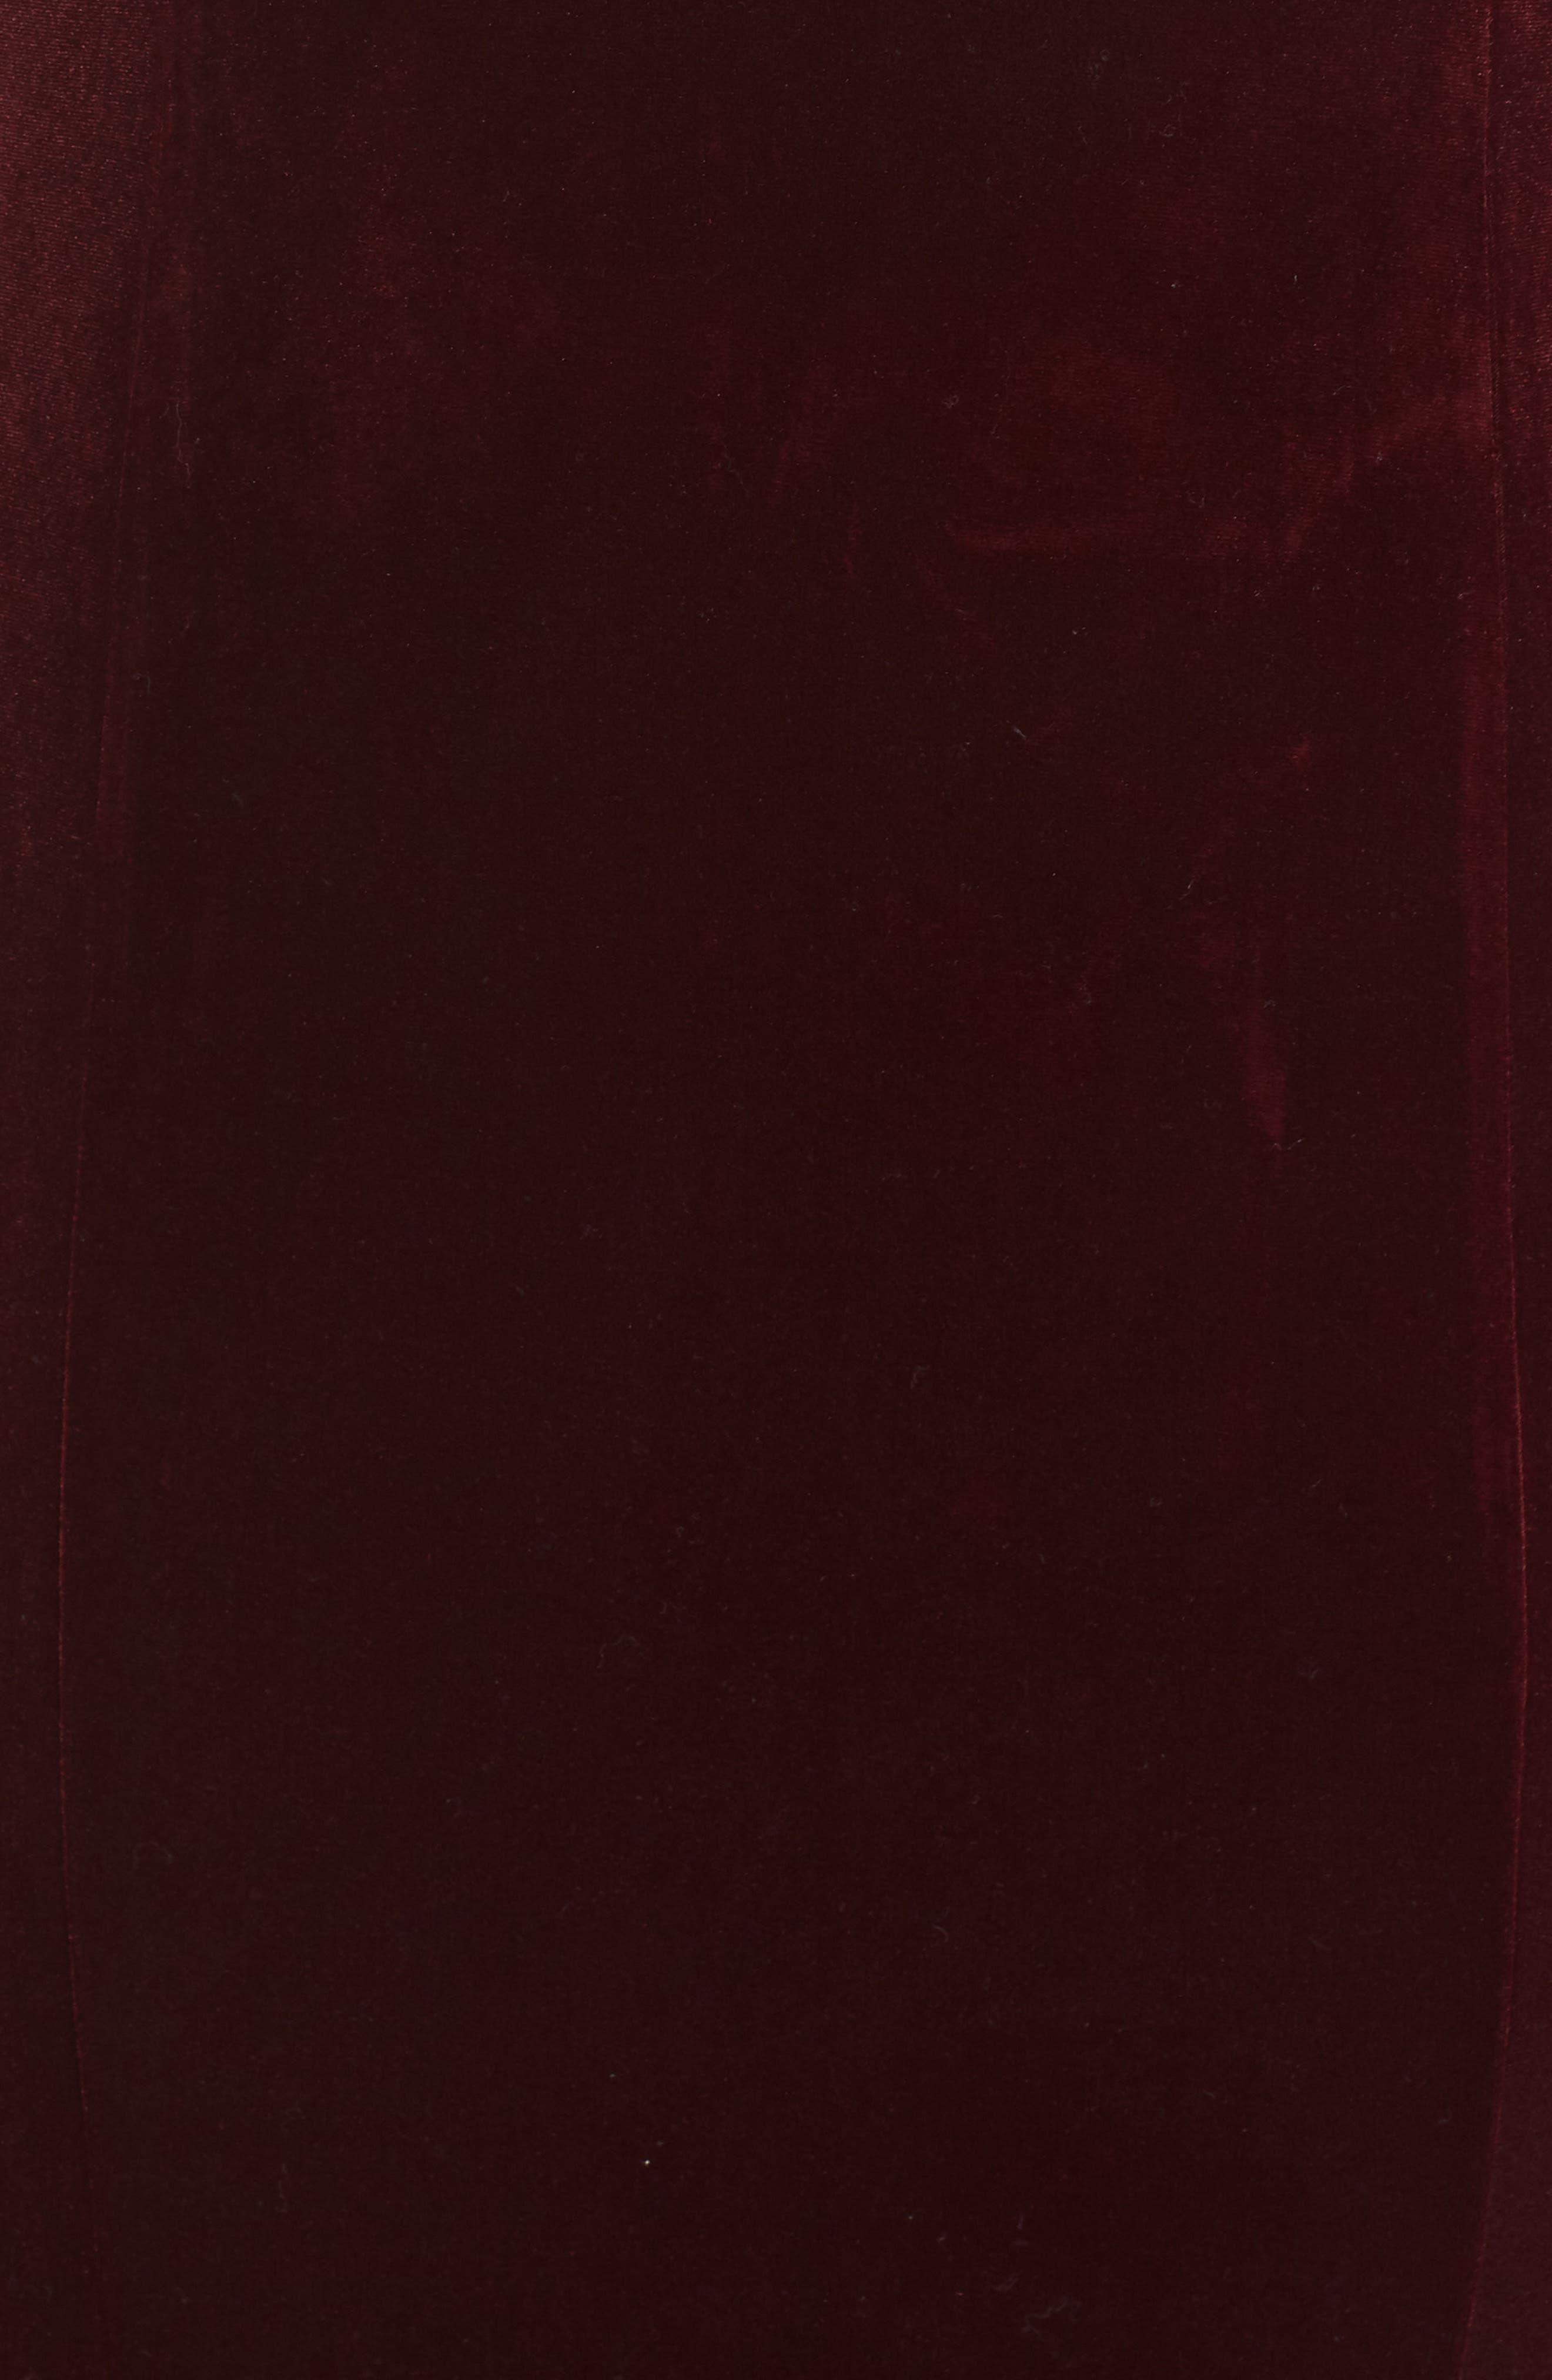 VINCE CAMUTO, Notch Neck Velvet Off the Shoulder Gown, Alternate thumbnail 6, color, 930